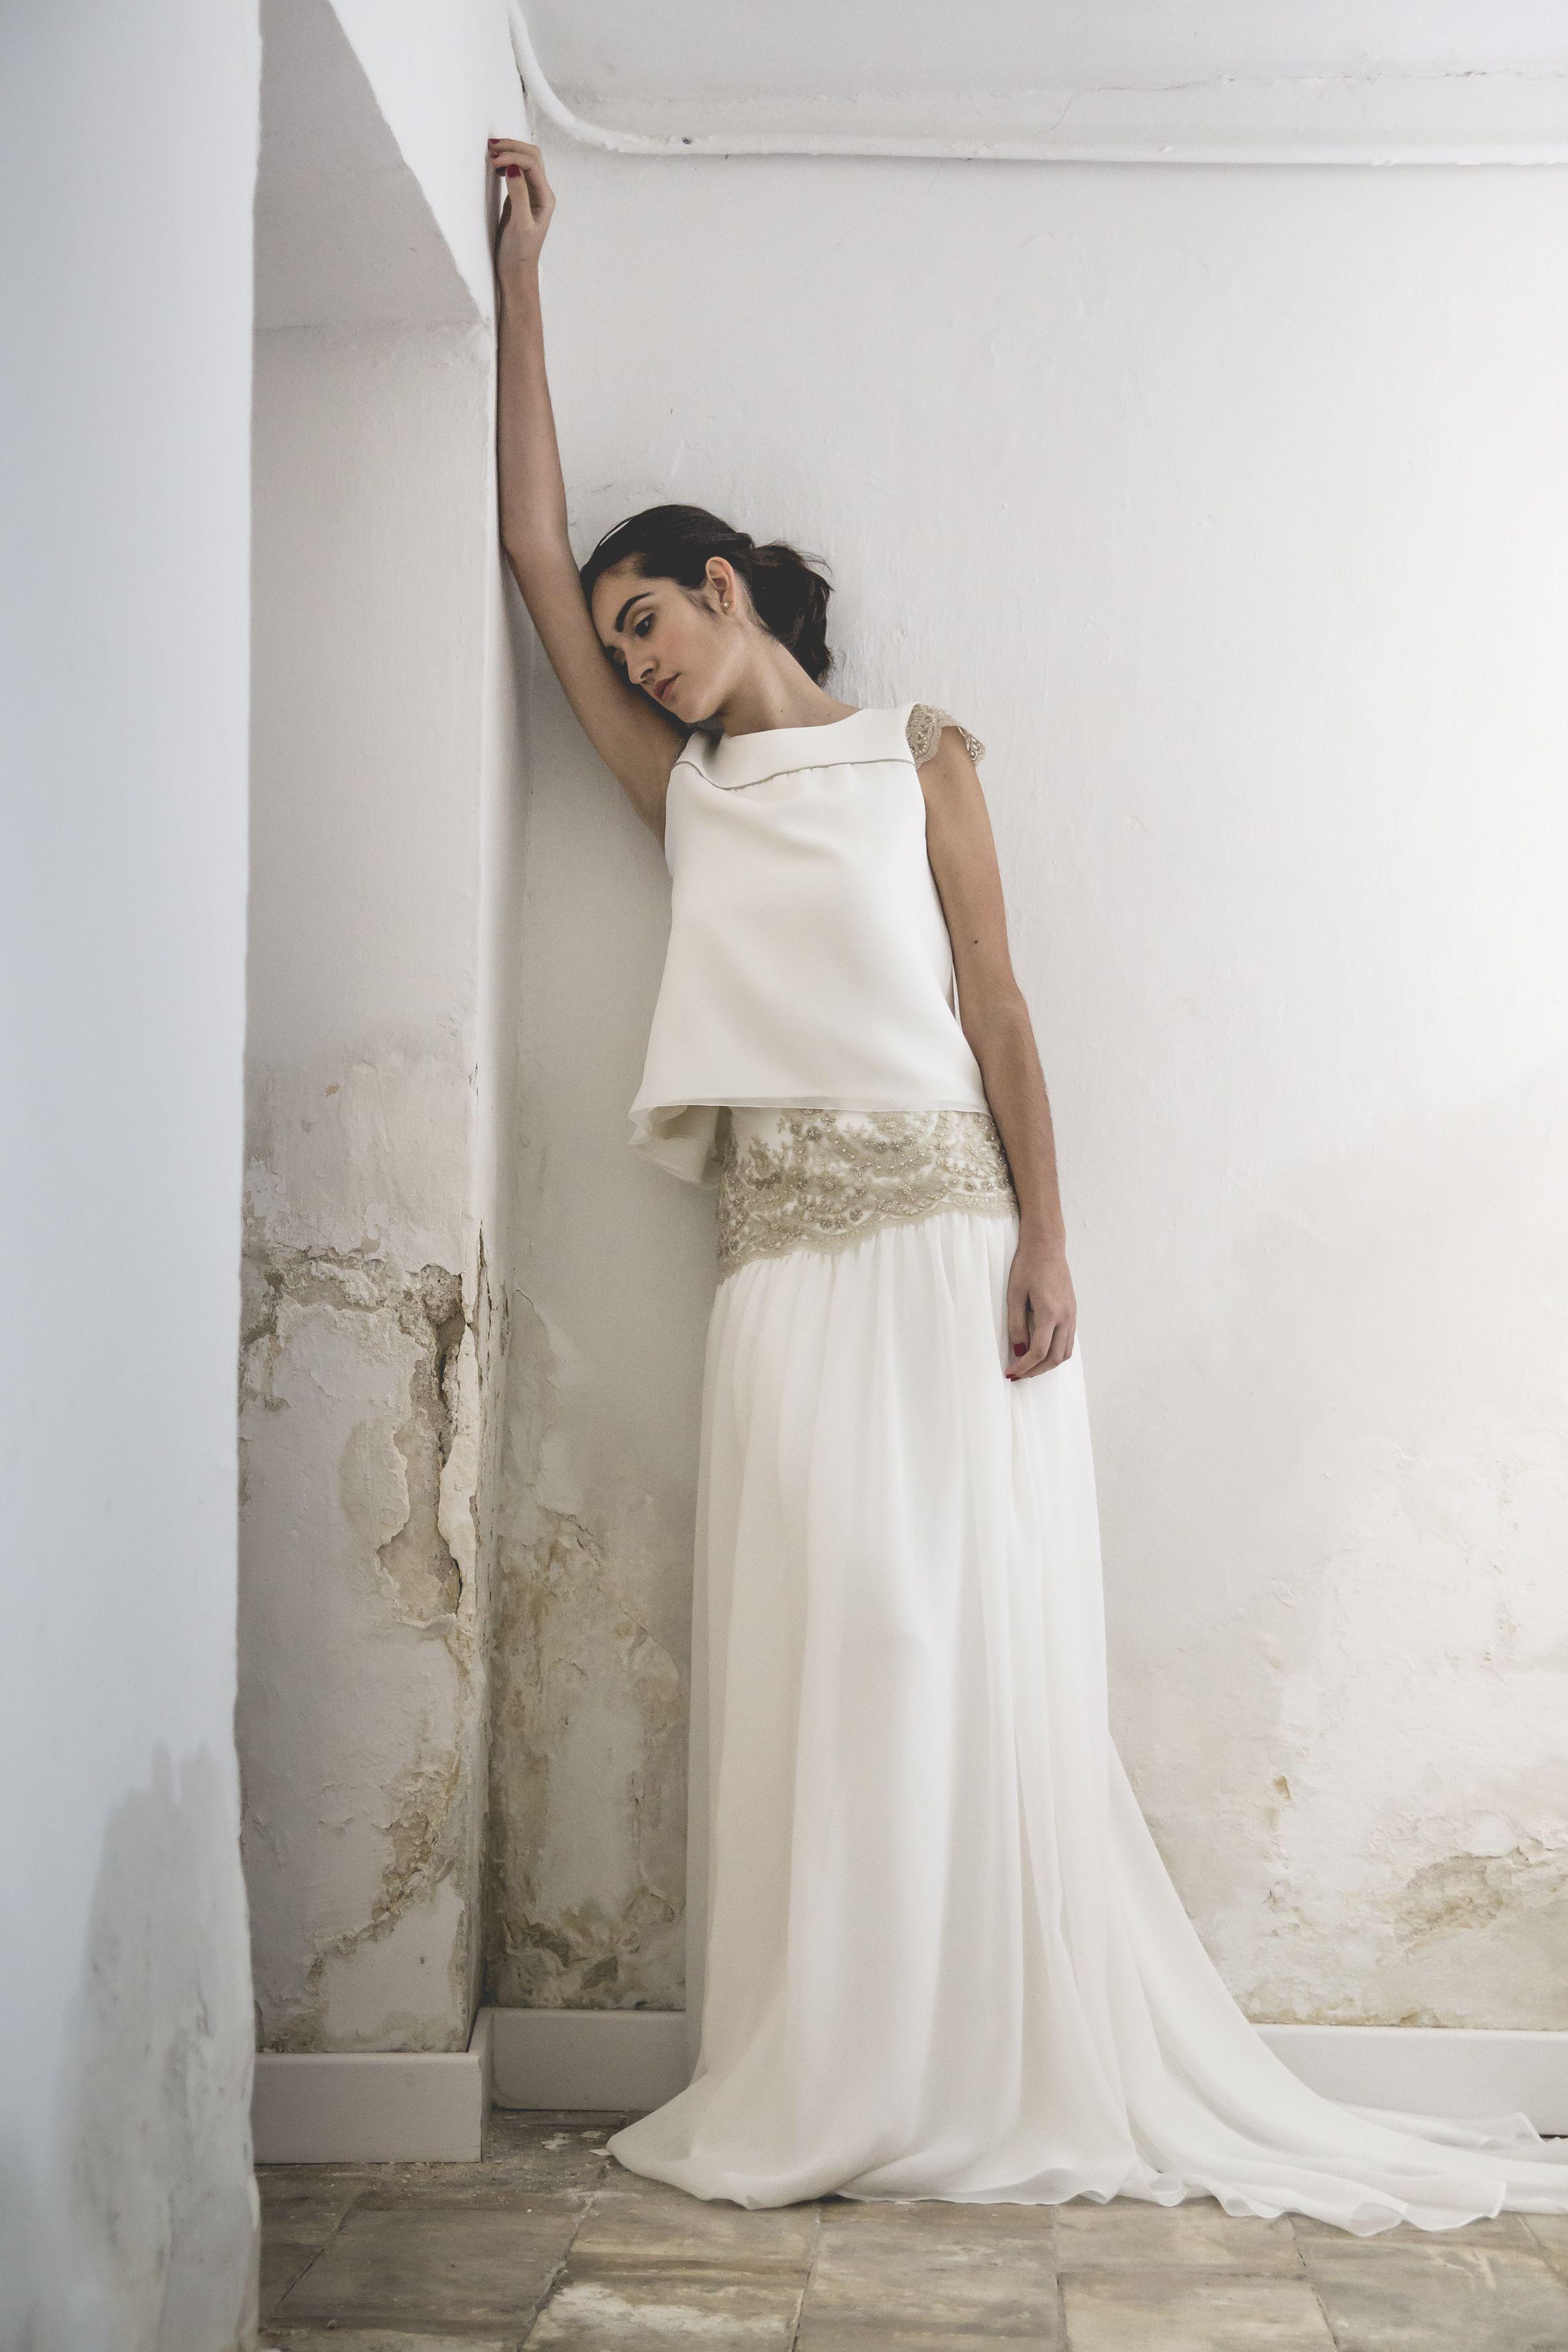 0199e1d4a alejandra-svarc-patriciasemir65-alta Accesorios Para Vestido Blanco